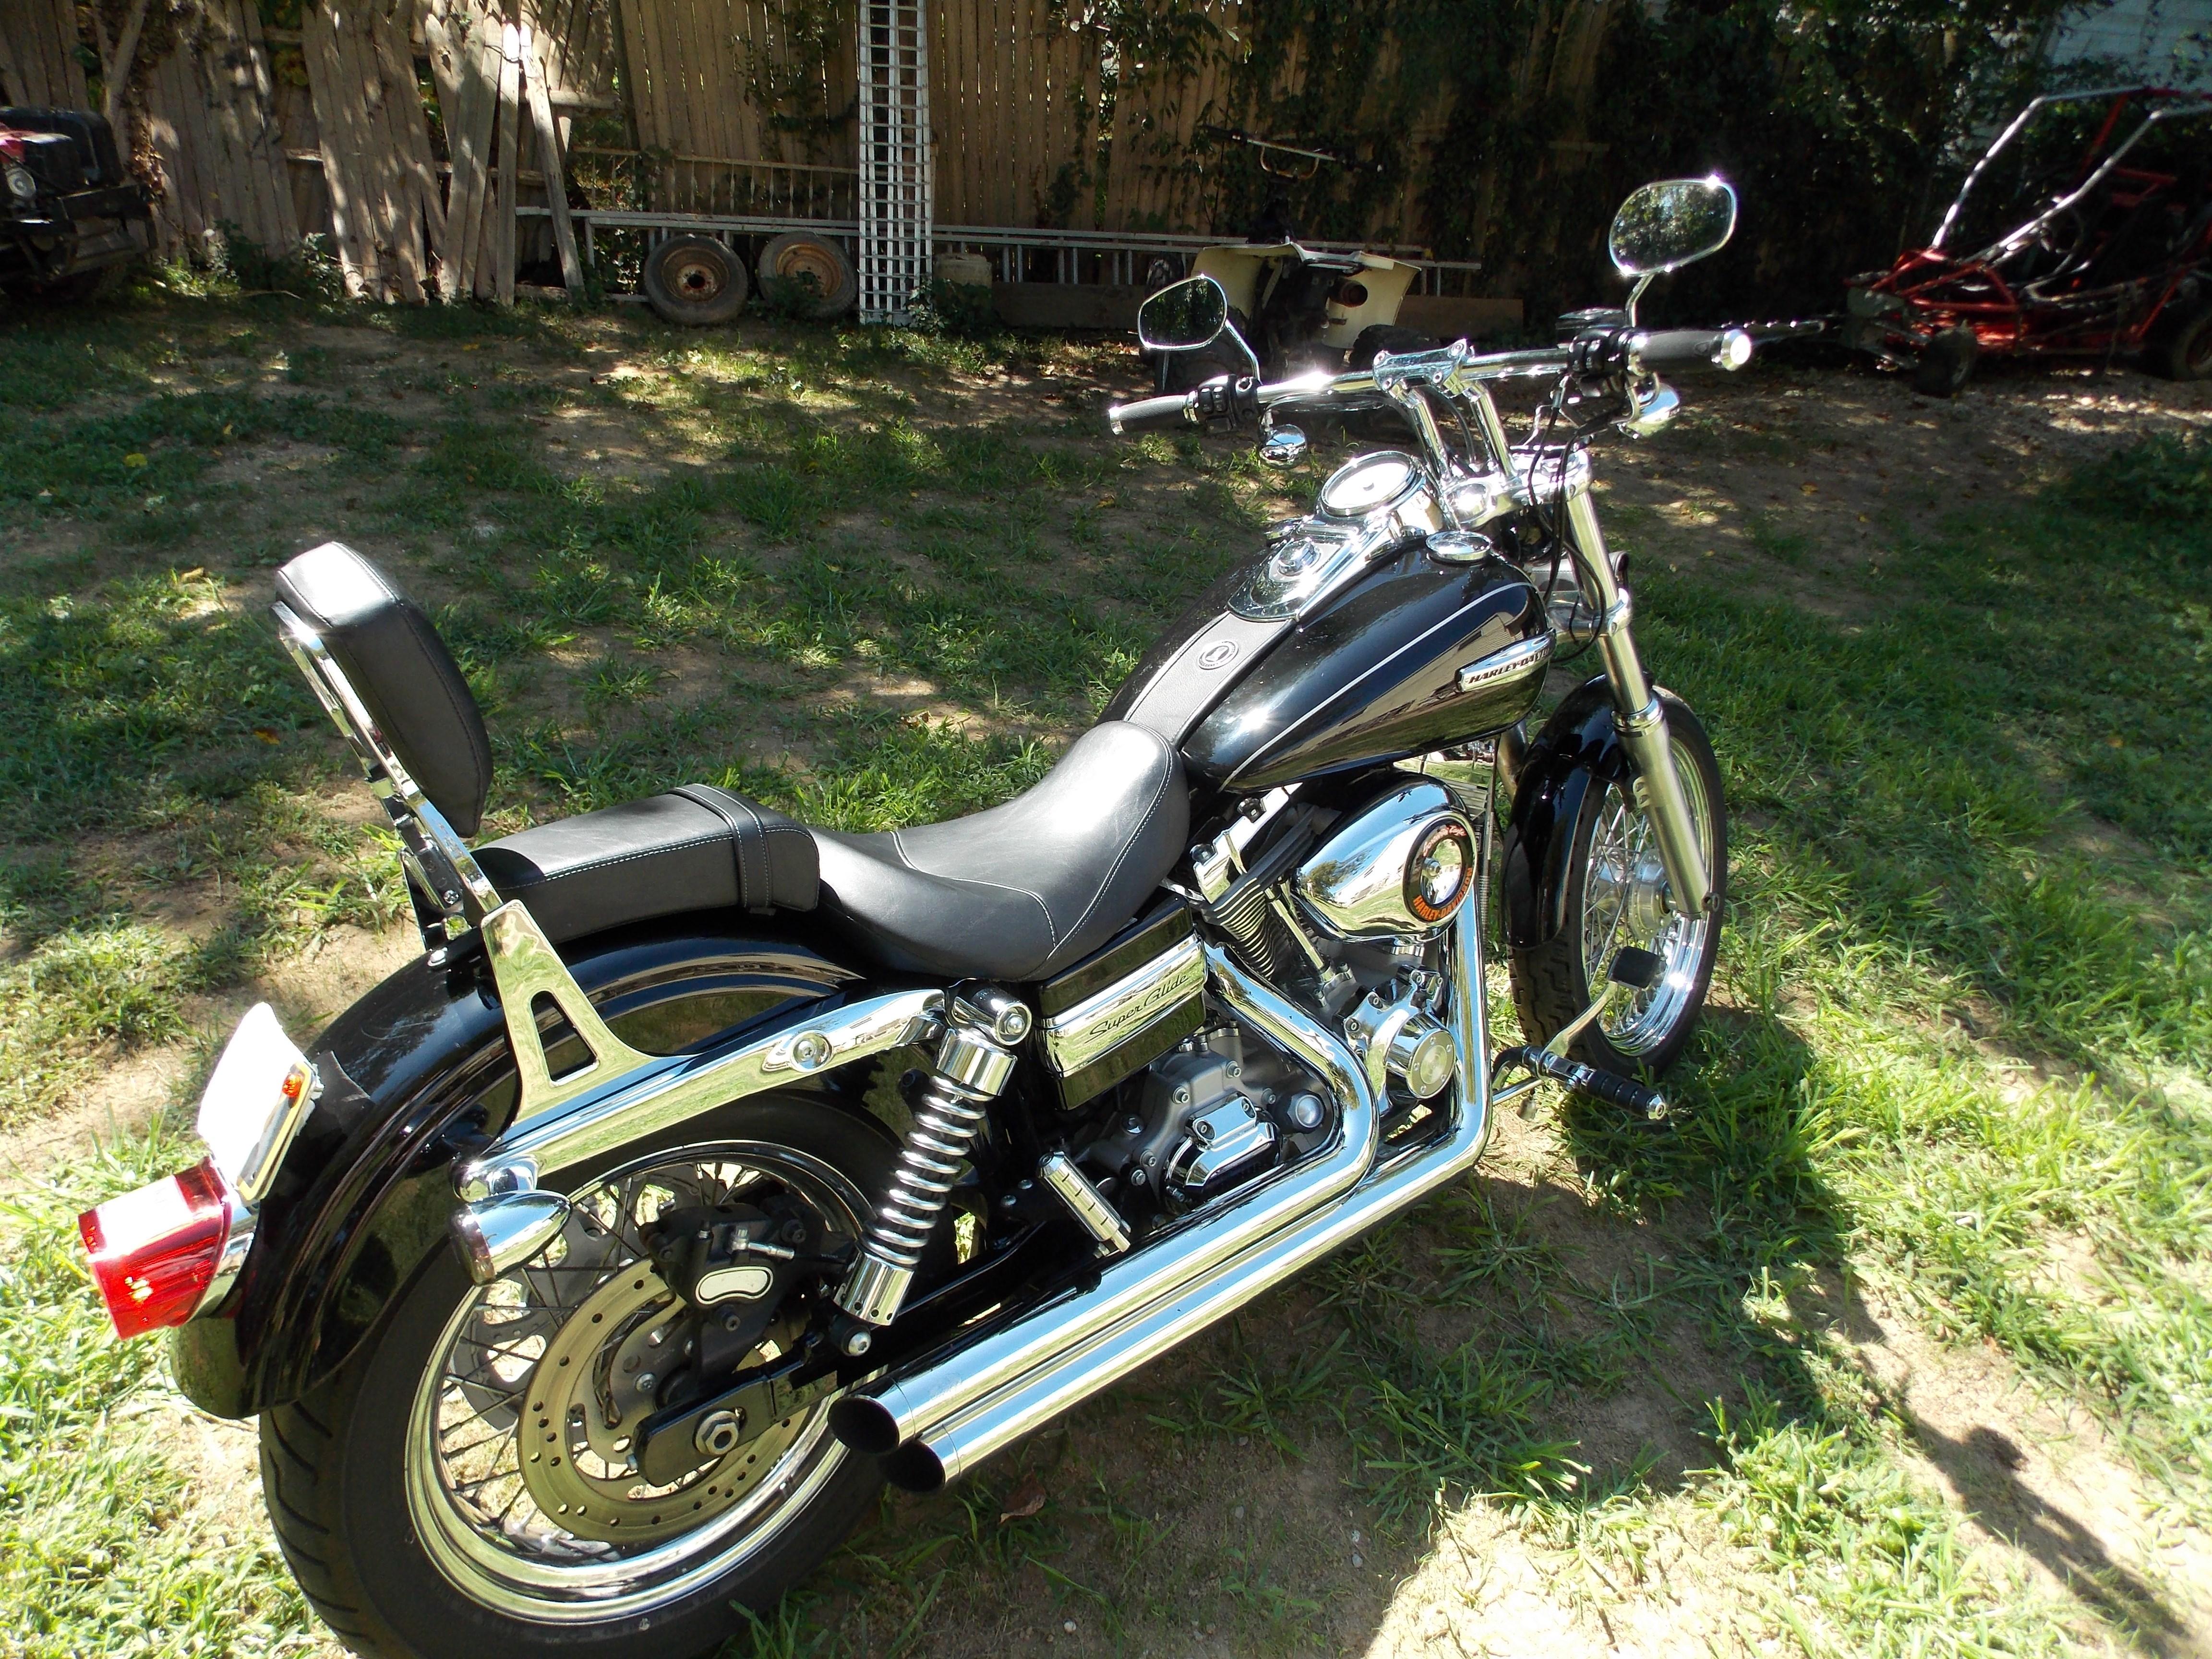 2016 Harley Dealer Newark De >> 2009 Harley-Davidson® FXDC Dyna® Super Glide® Custom (Black), Newark, Delaware (662223 ...